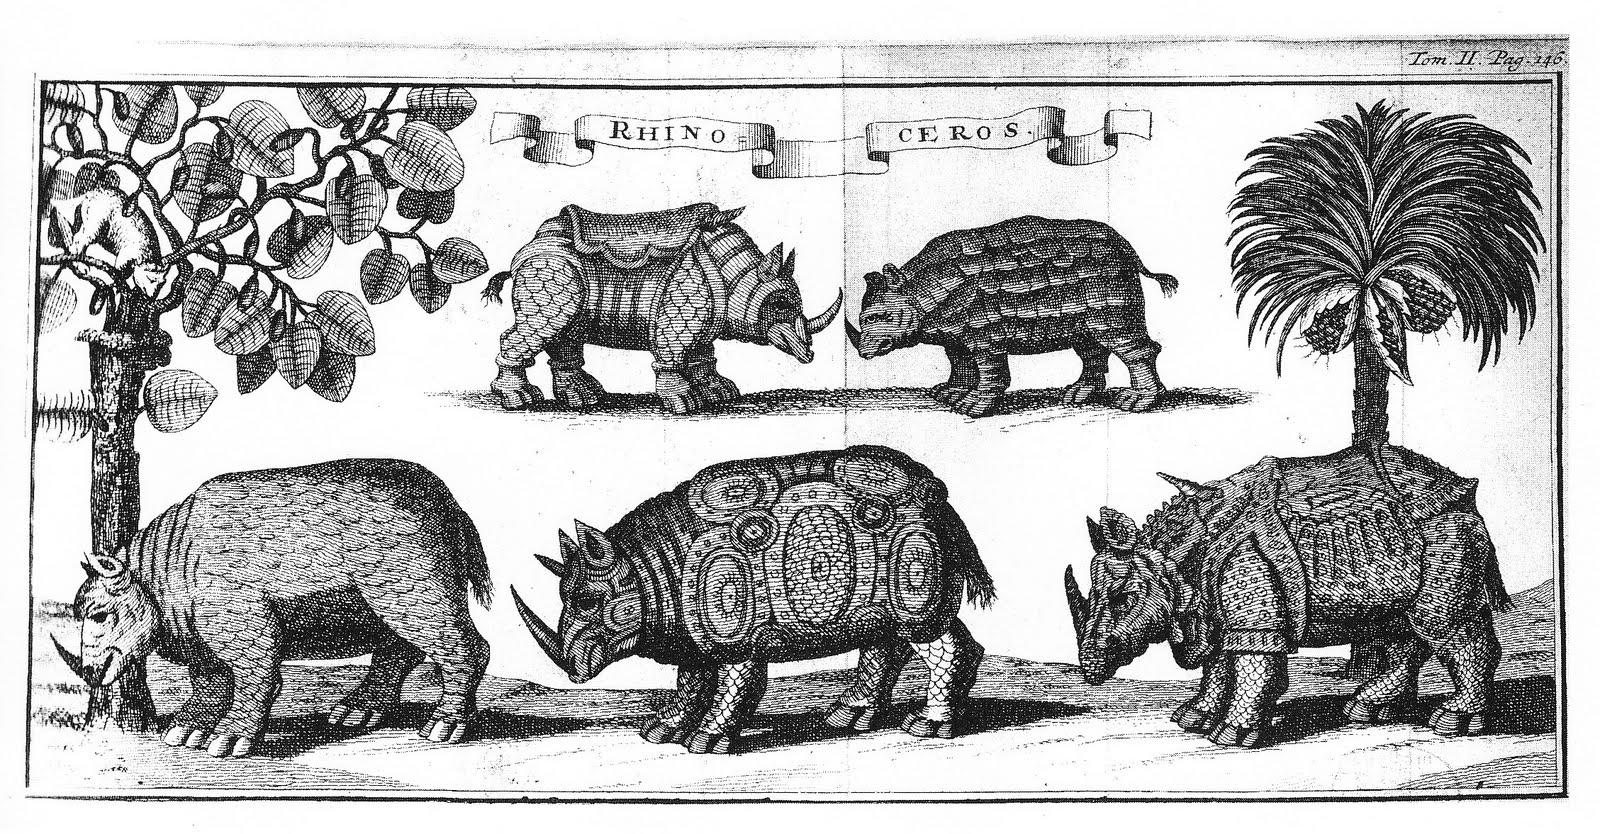 Drawn rhino medieval animal Of rhino species The claimed